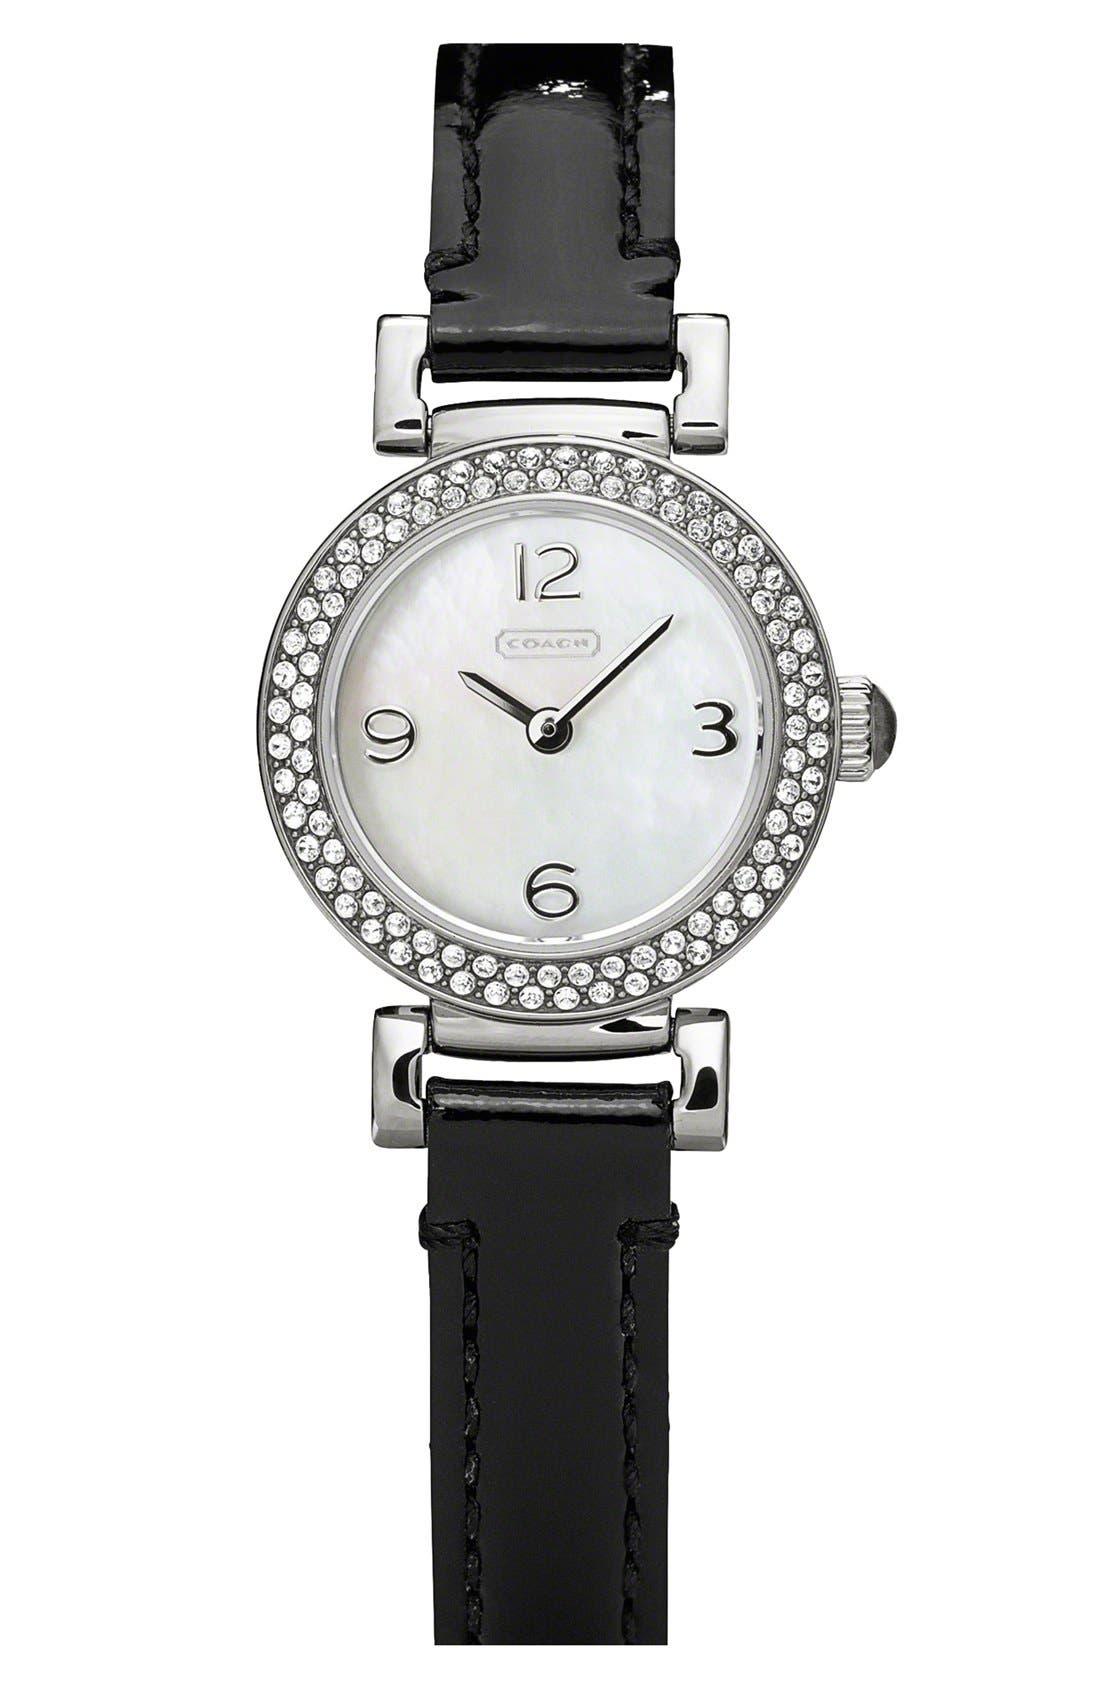 Main Image - COACH 'Madison' Round Crystal Bezel Leather Strap Watch, 23mm